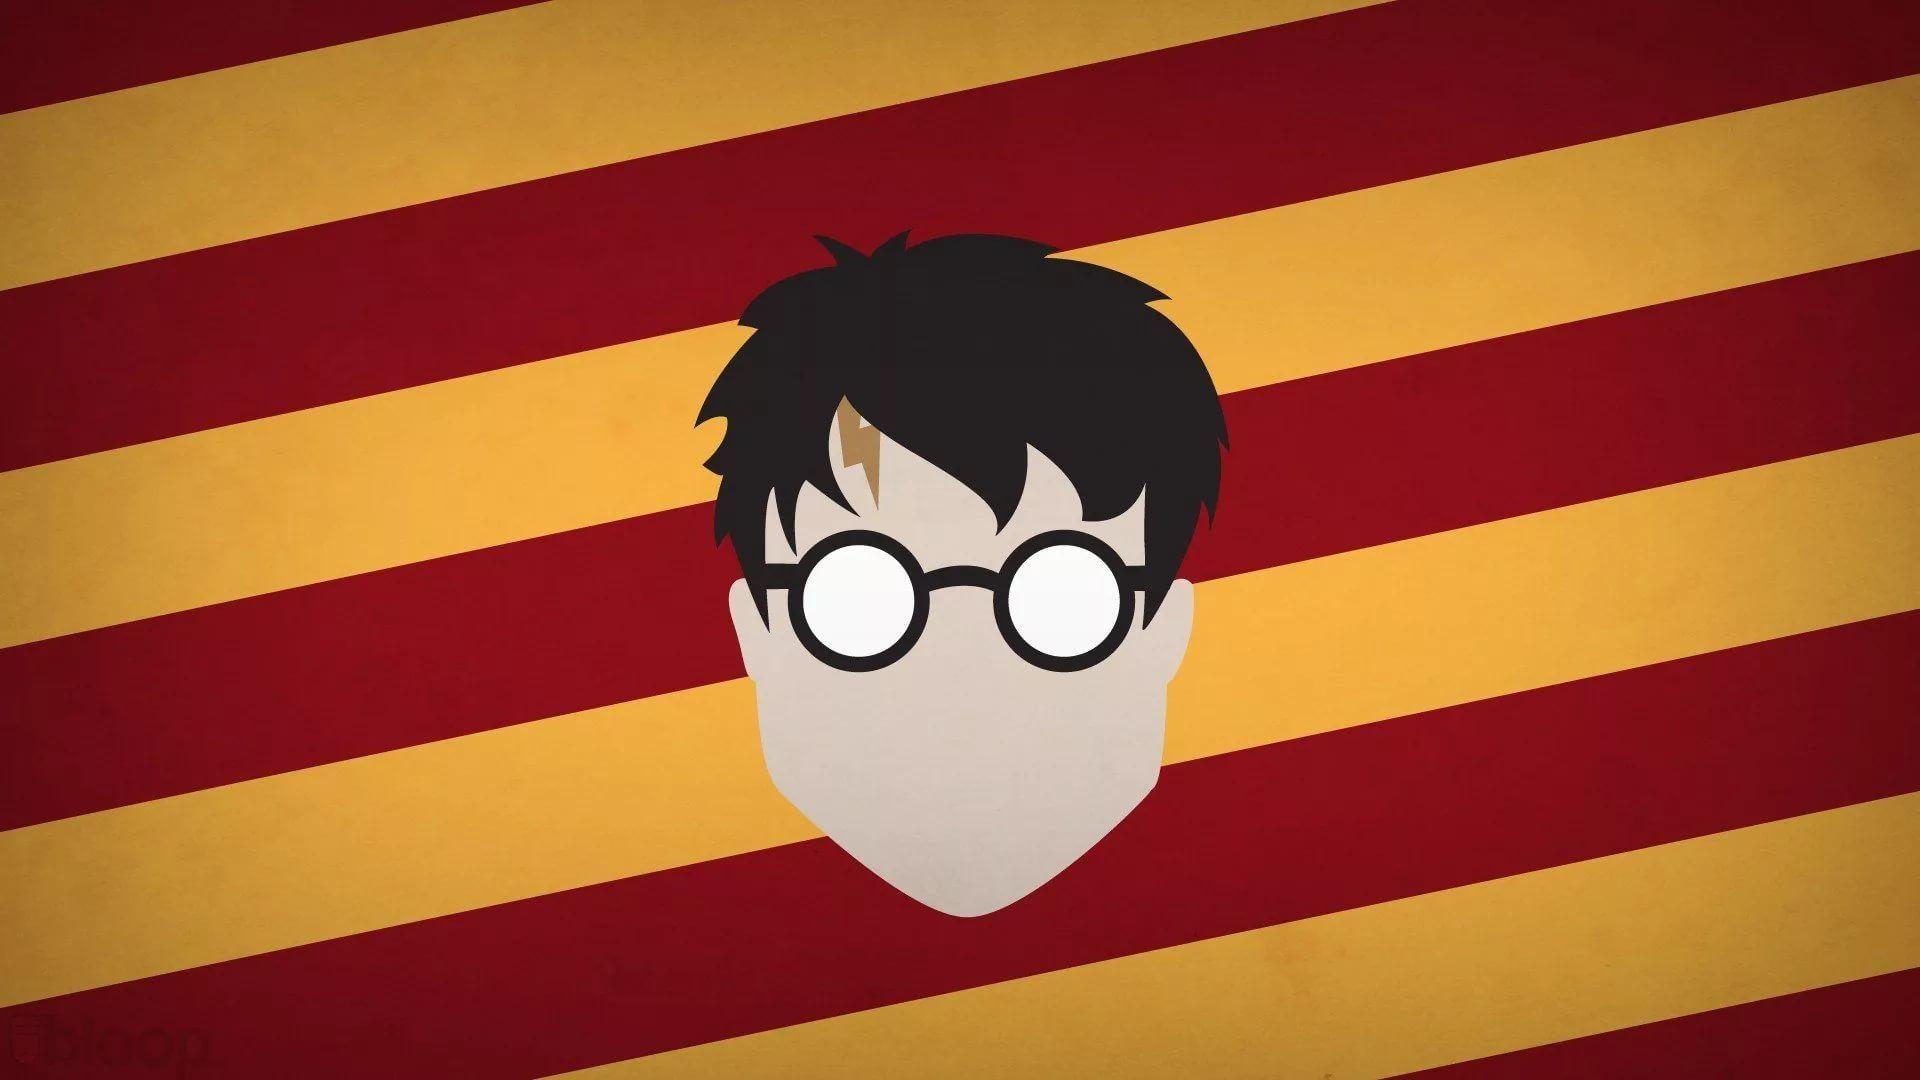 Harry Potter Good Wallpaper